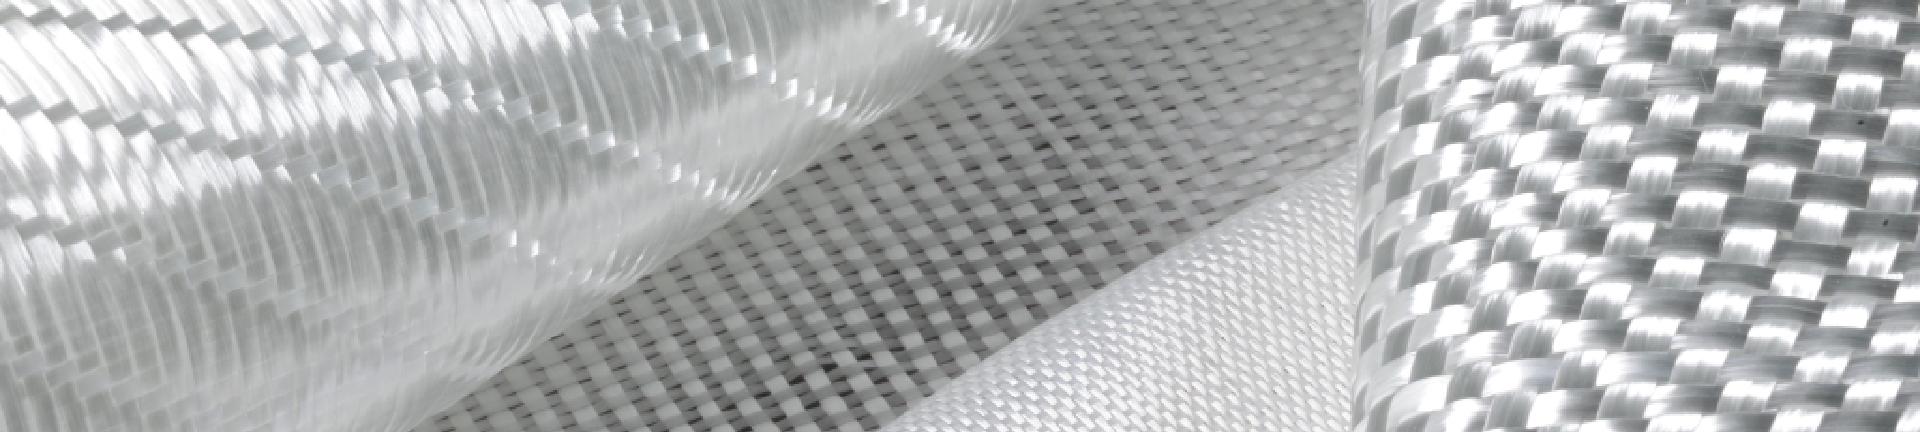 Chomarat™ Composites Reinforcements